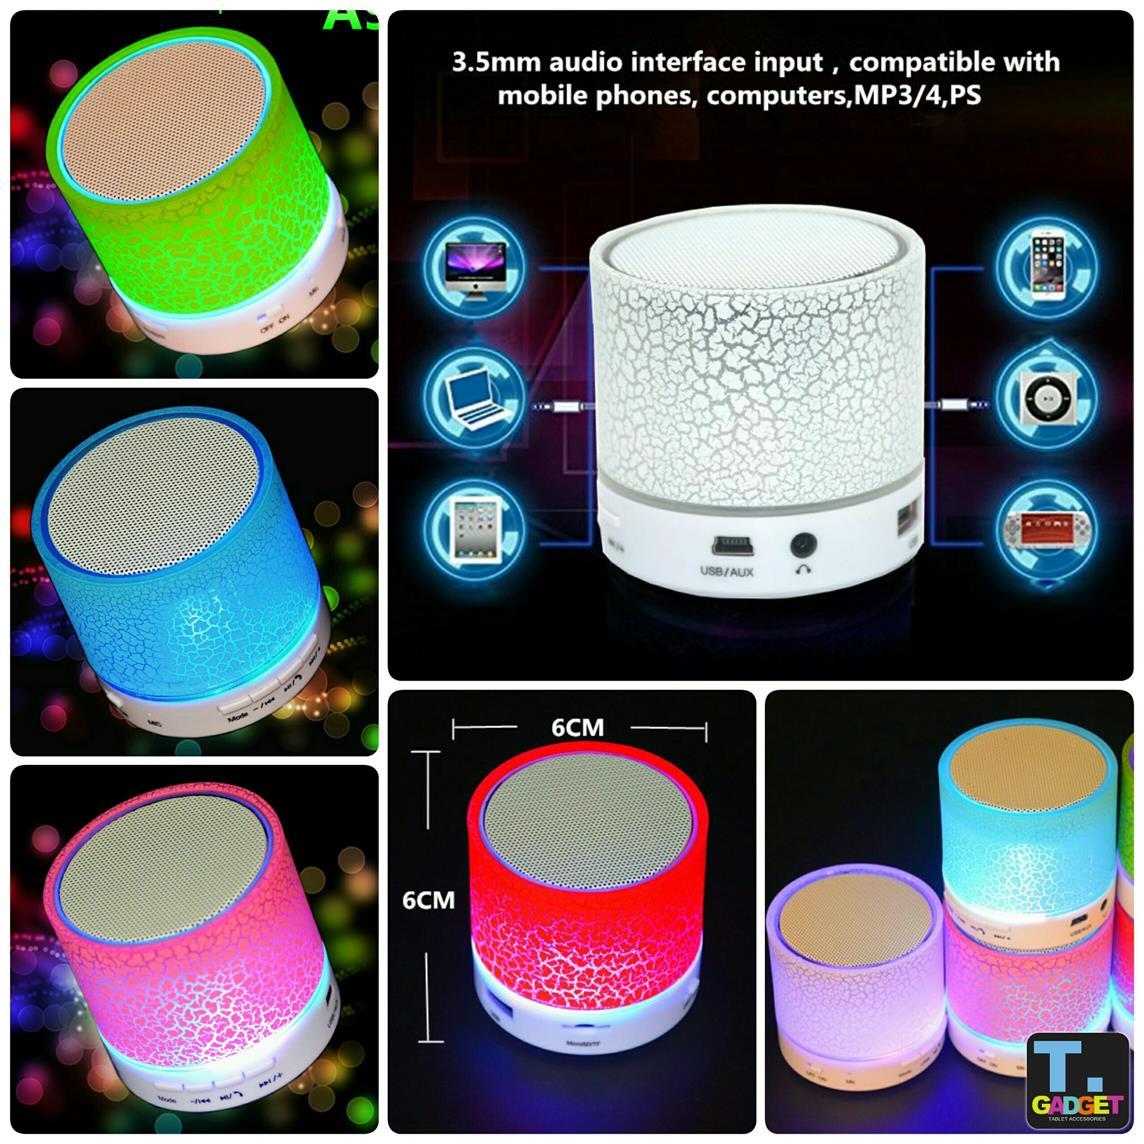 Led Mini Bluetooth Speaker A9 Tf Us End 8 11 2019 1149 Pm Usb Fm Wireless Portable Music Sound